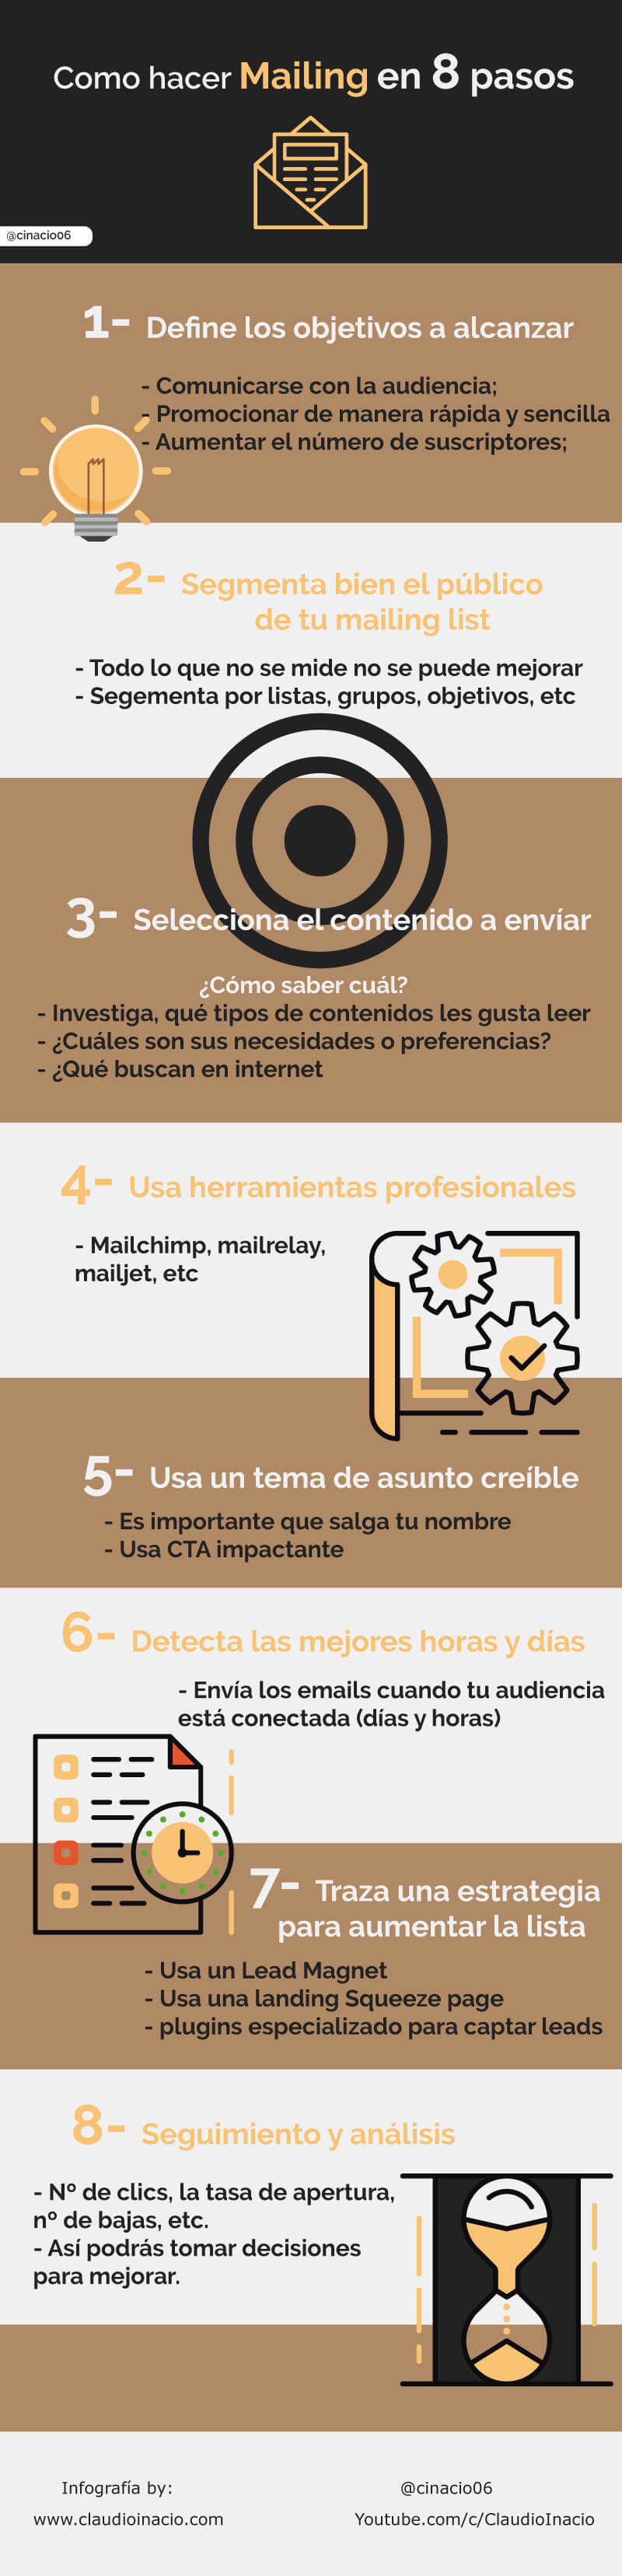 infografia como hacer un buen mailing en 8 pasos